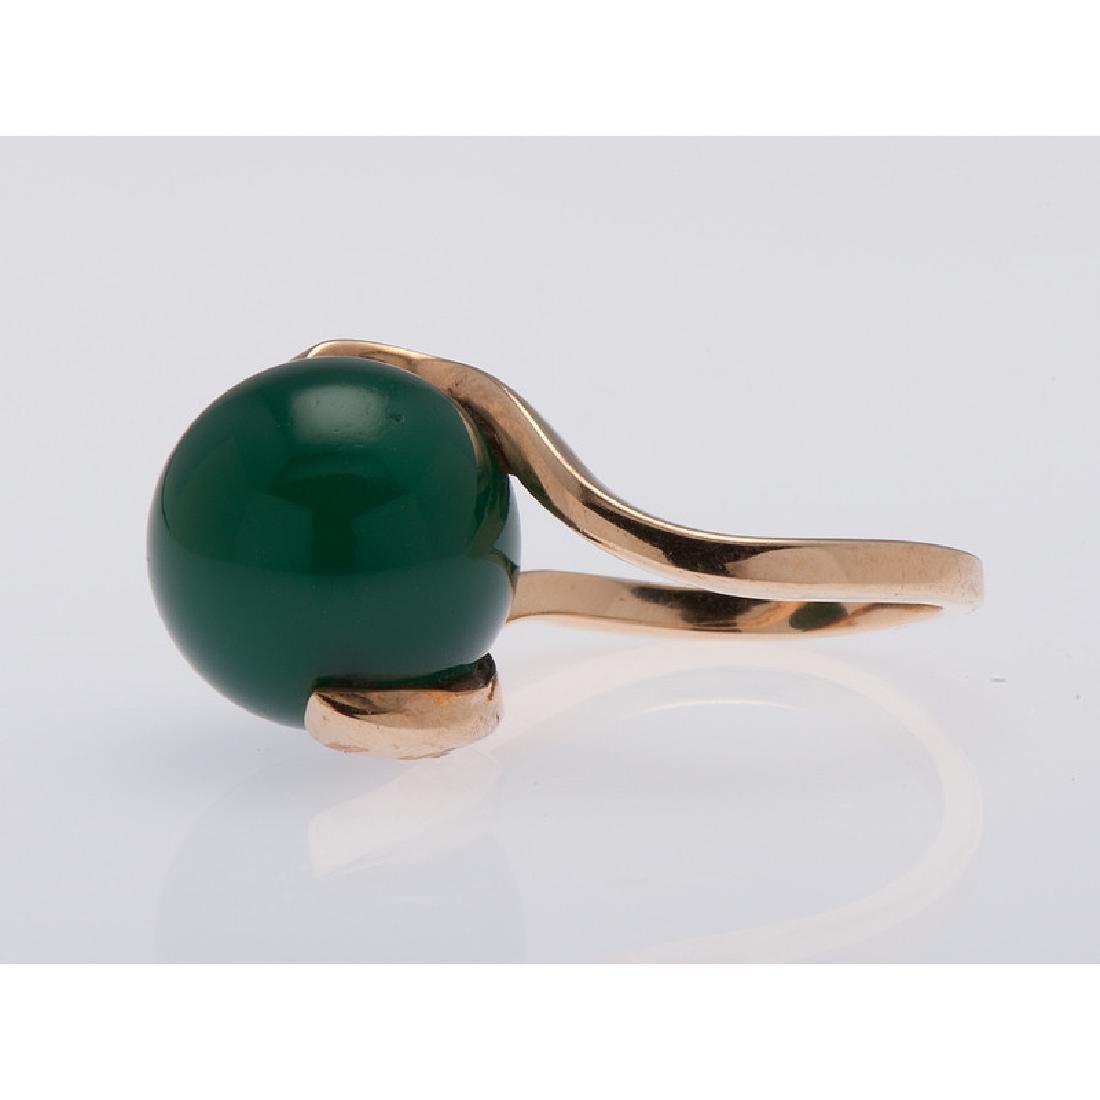 14 Karat Yellow Gold Green Onyx Ring - 3